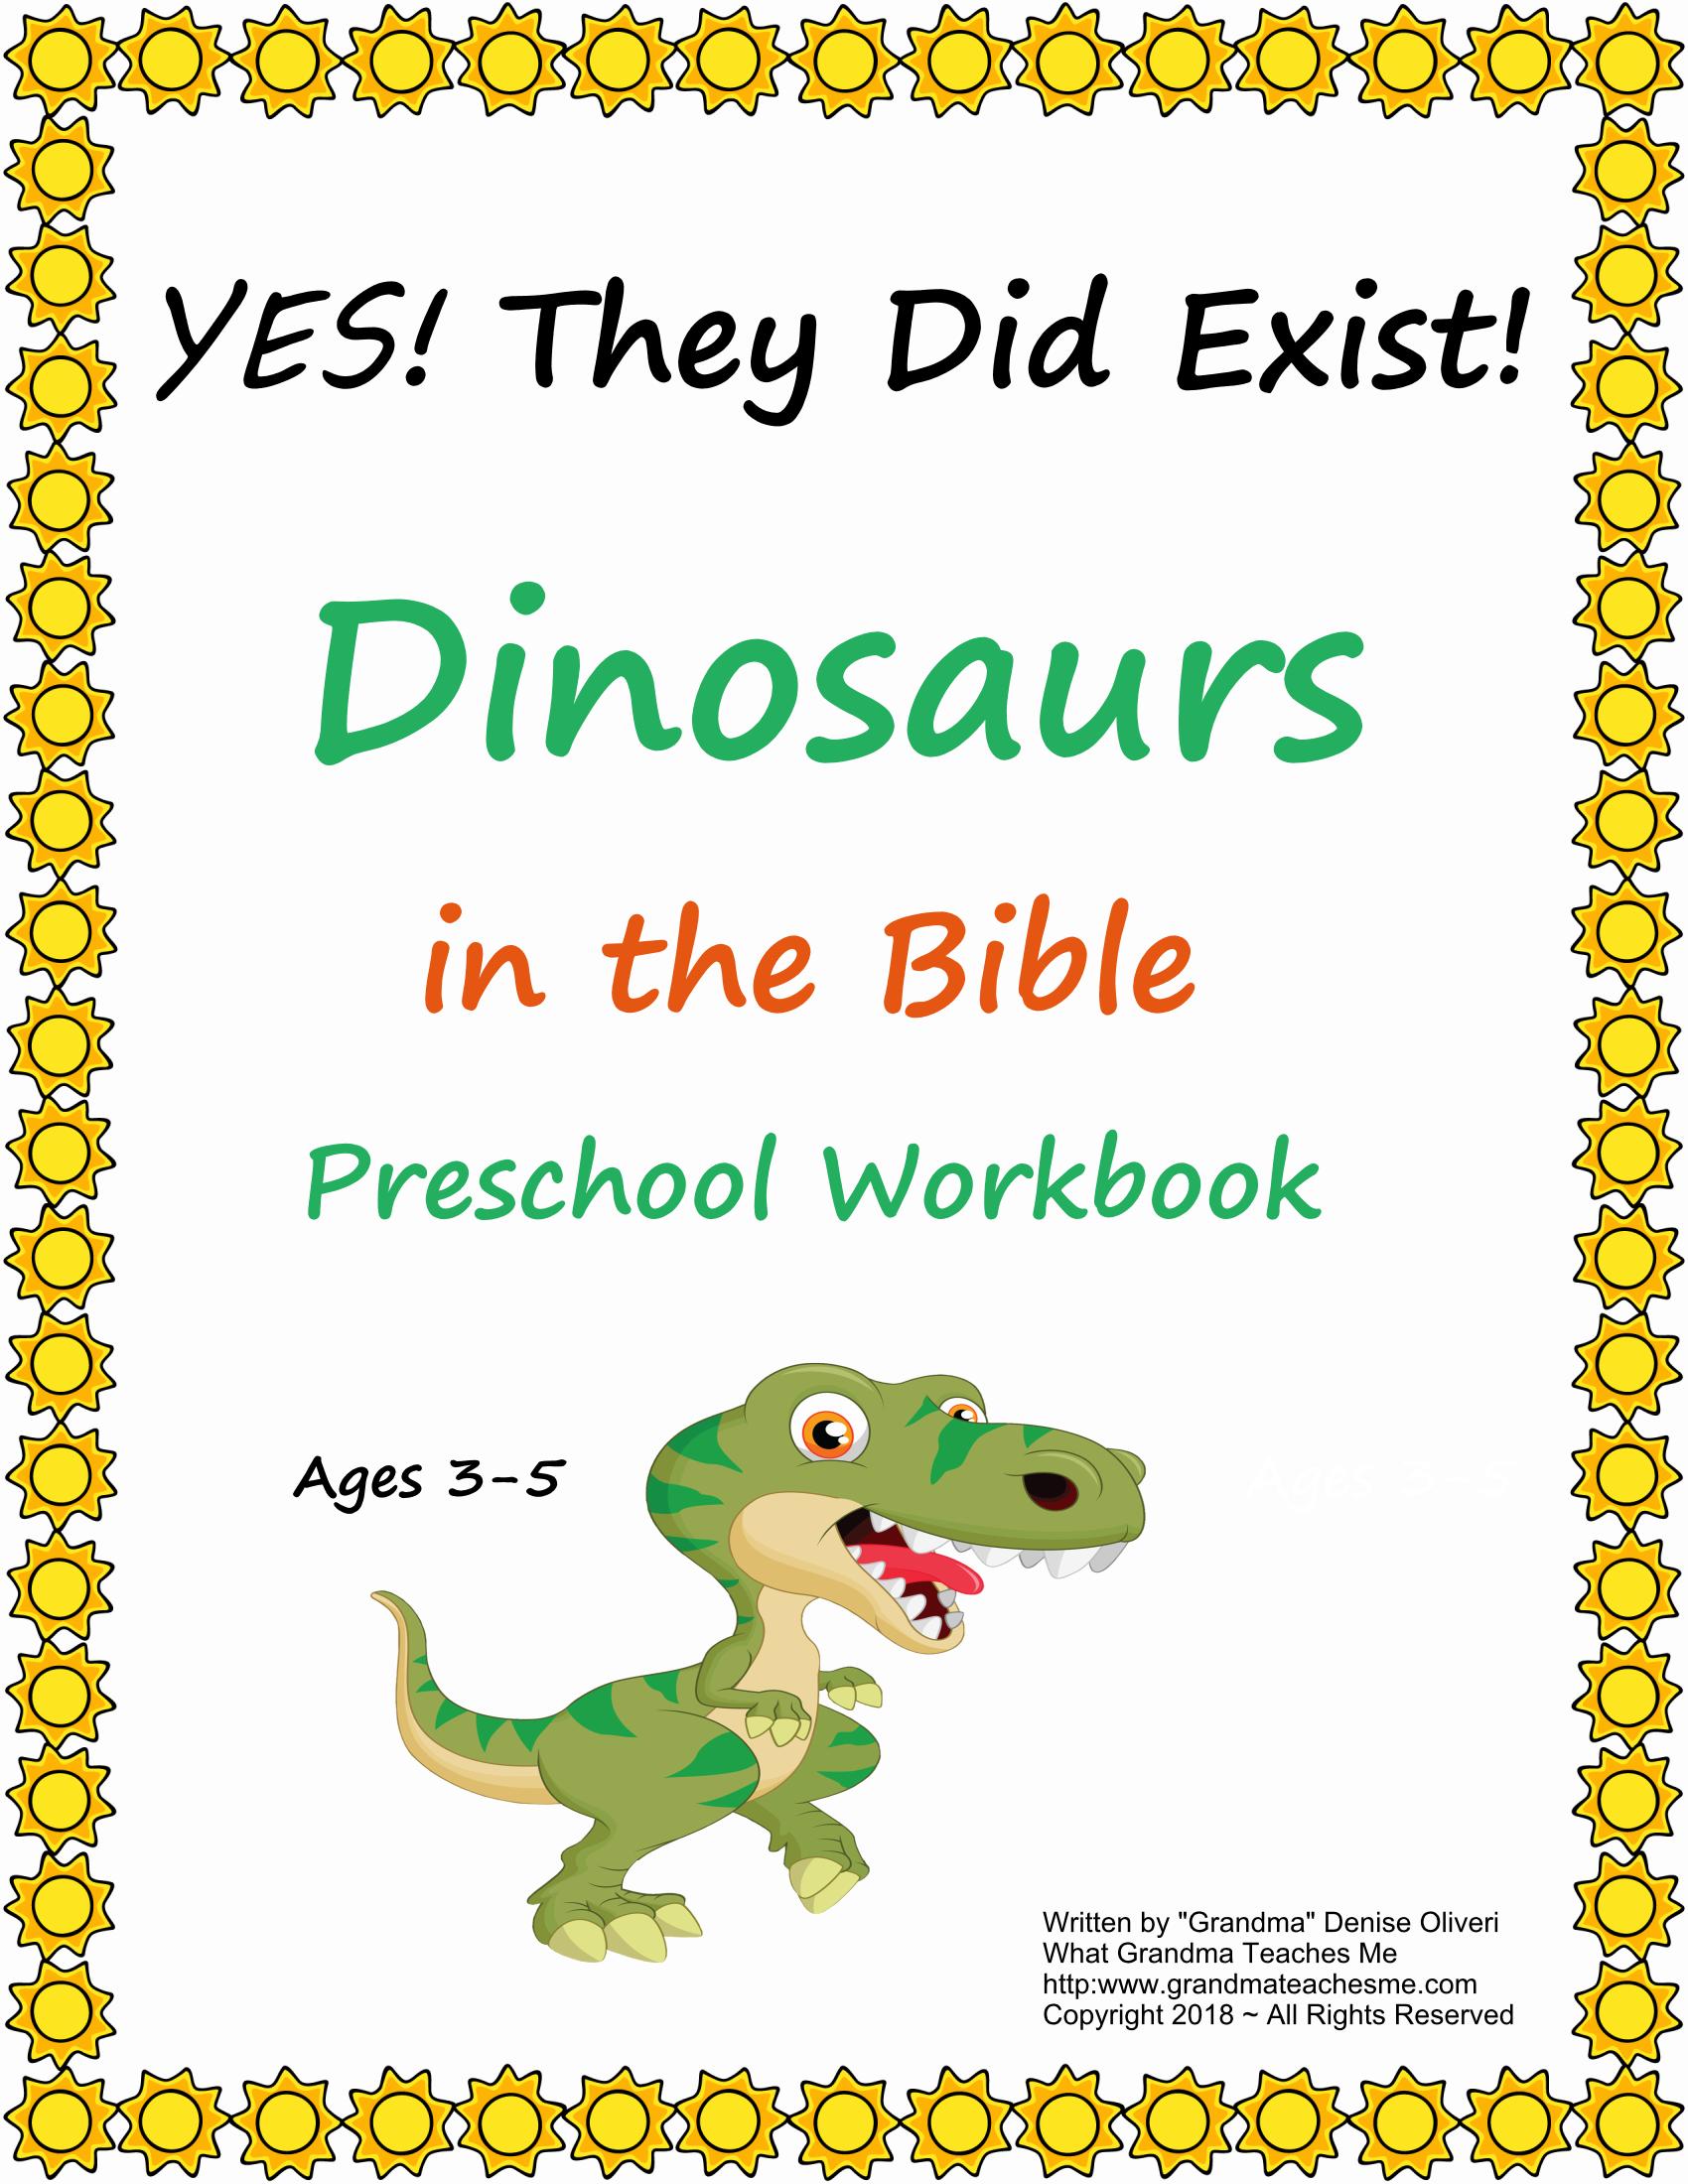 Educational Preschool Printables | Pinterest | Homeschool ...